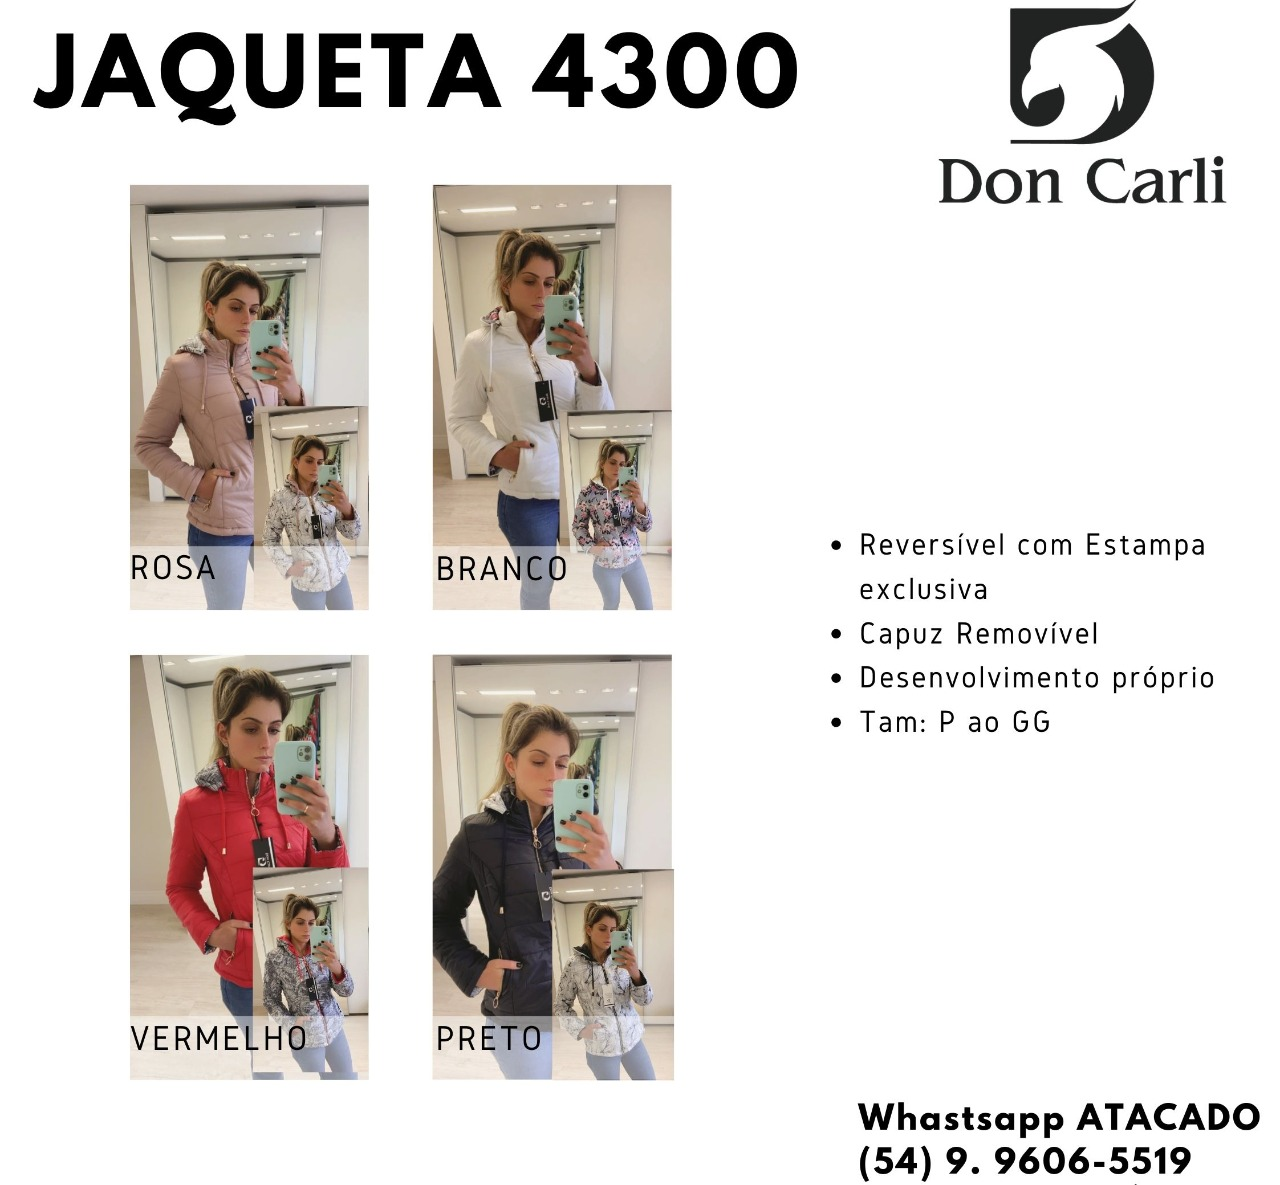 Jaqueta Don Carli 4300